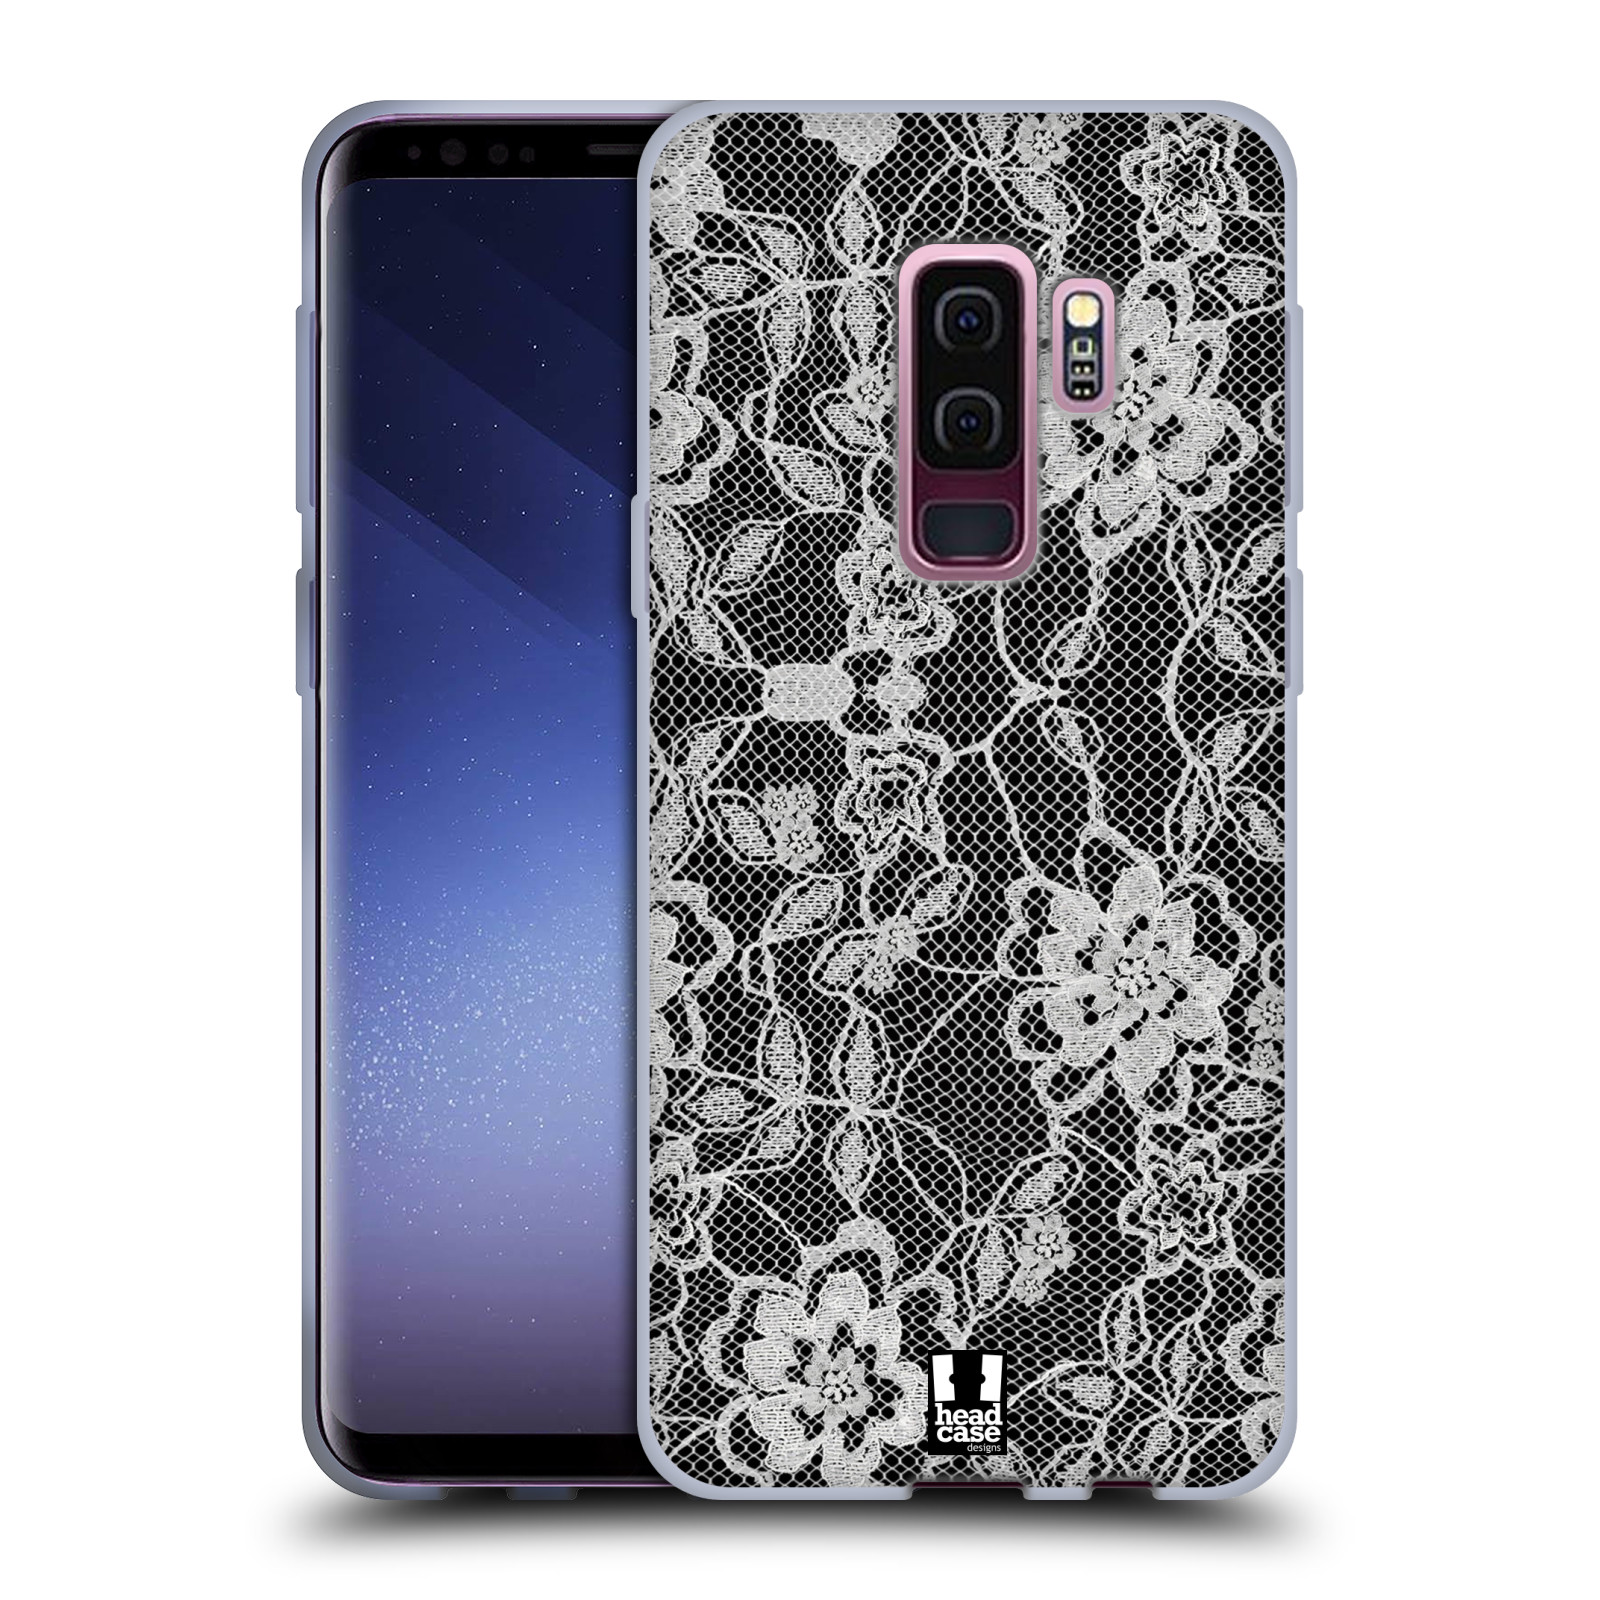 Silikonové pouzdro na mobil Samsung Galaxy S9 Plus - Head Case - FLOWERY KRAJKA